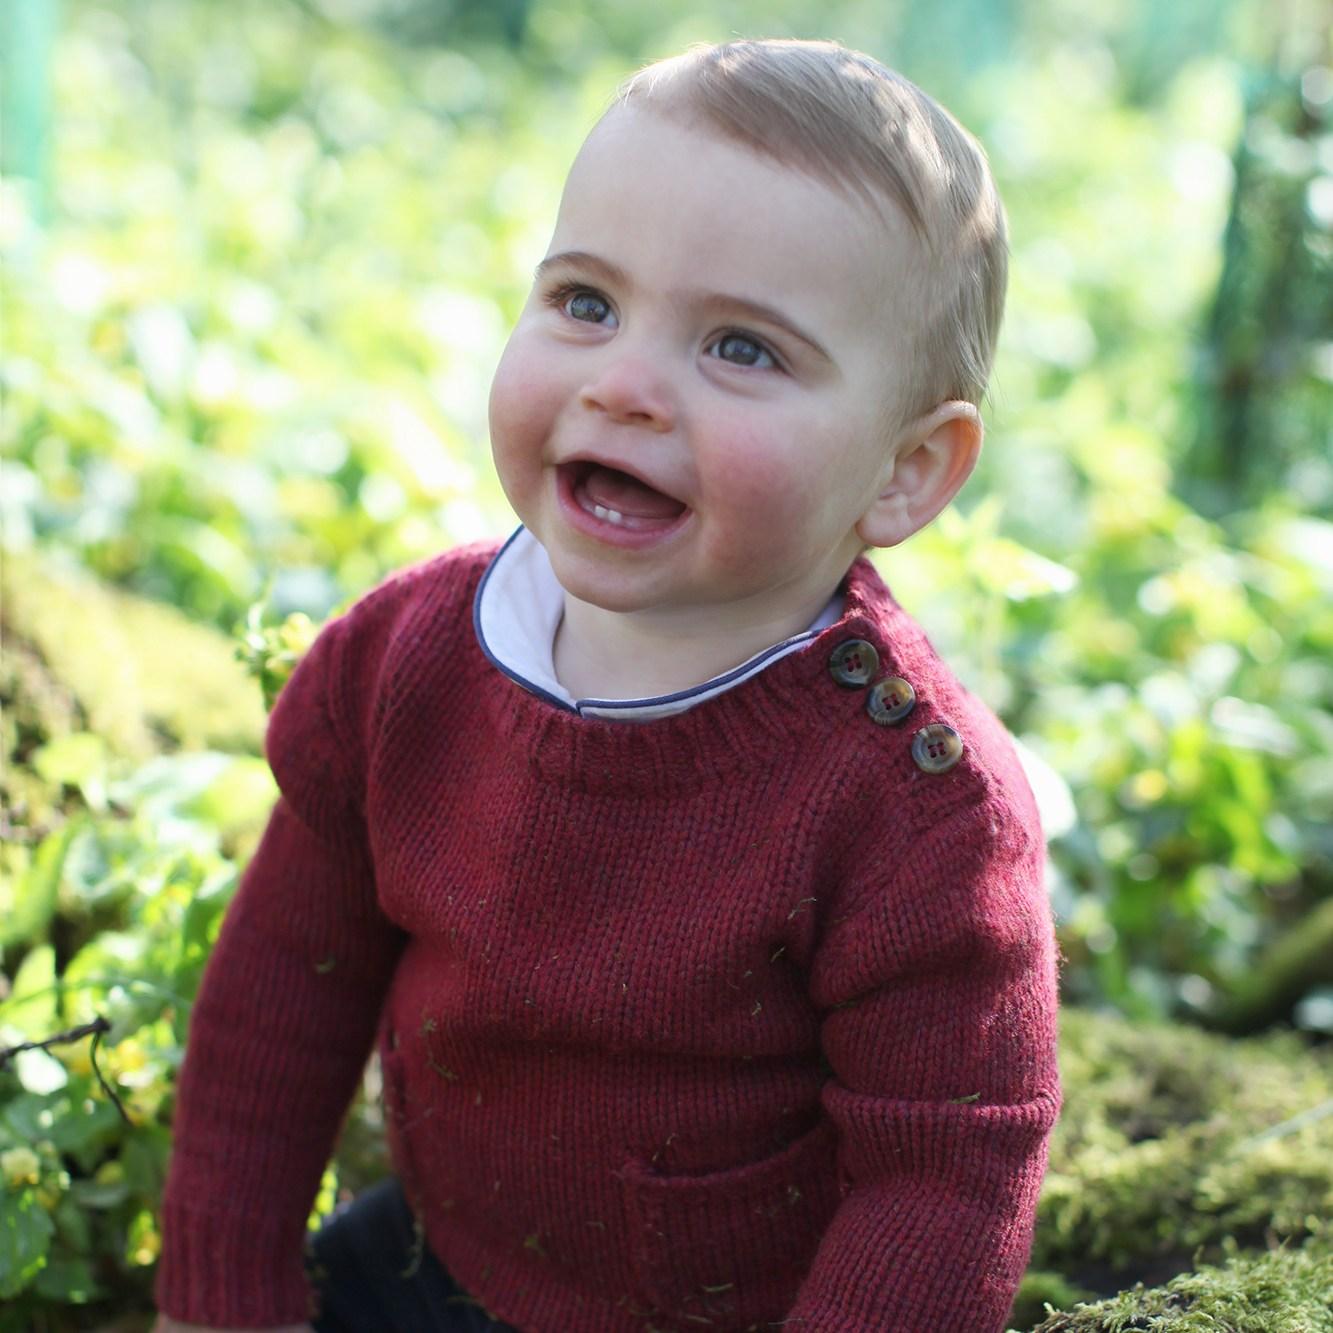 Prince-Louis-1st-birthday